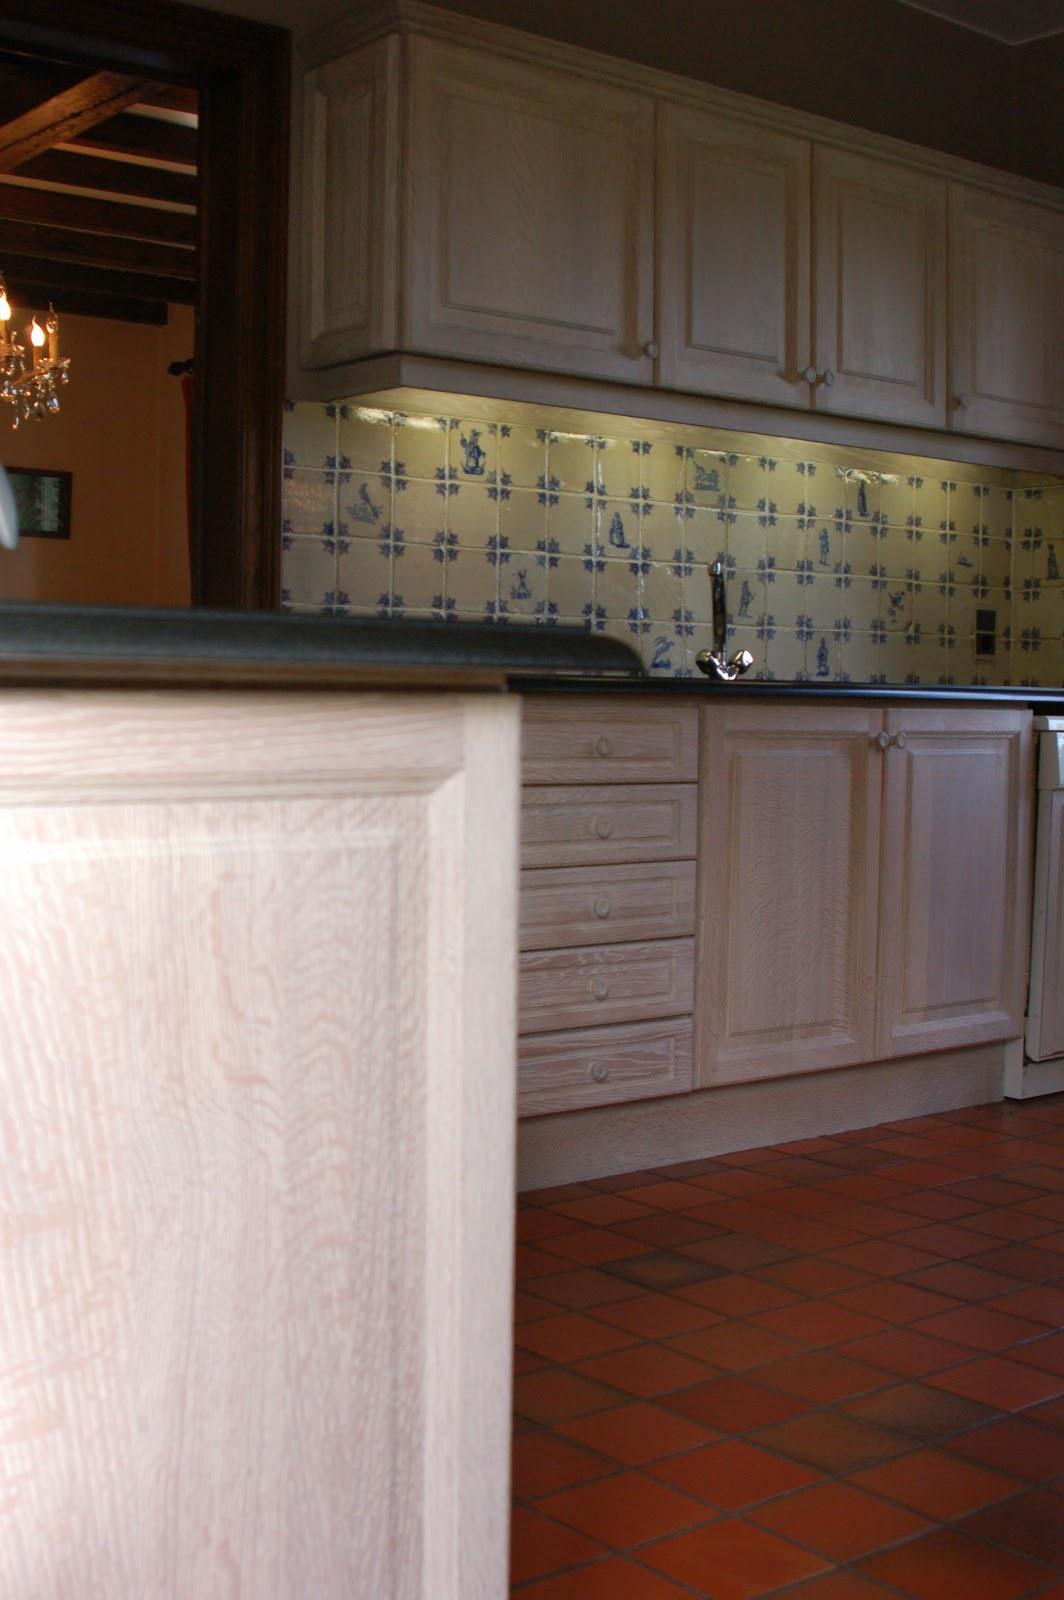 Eiken Keukens Vernieuwen : Renovatie eiken keuken Brakel Renovatie van eiken keukens